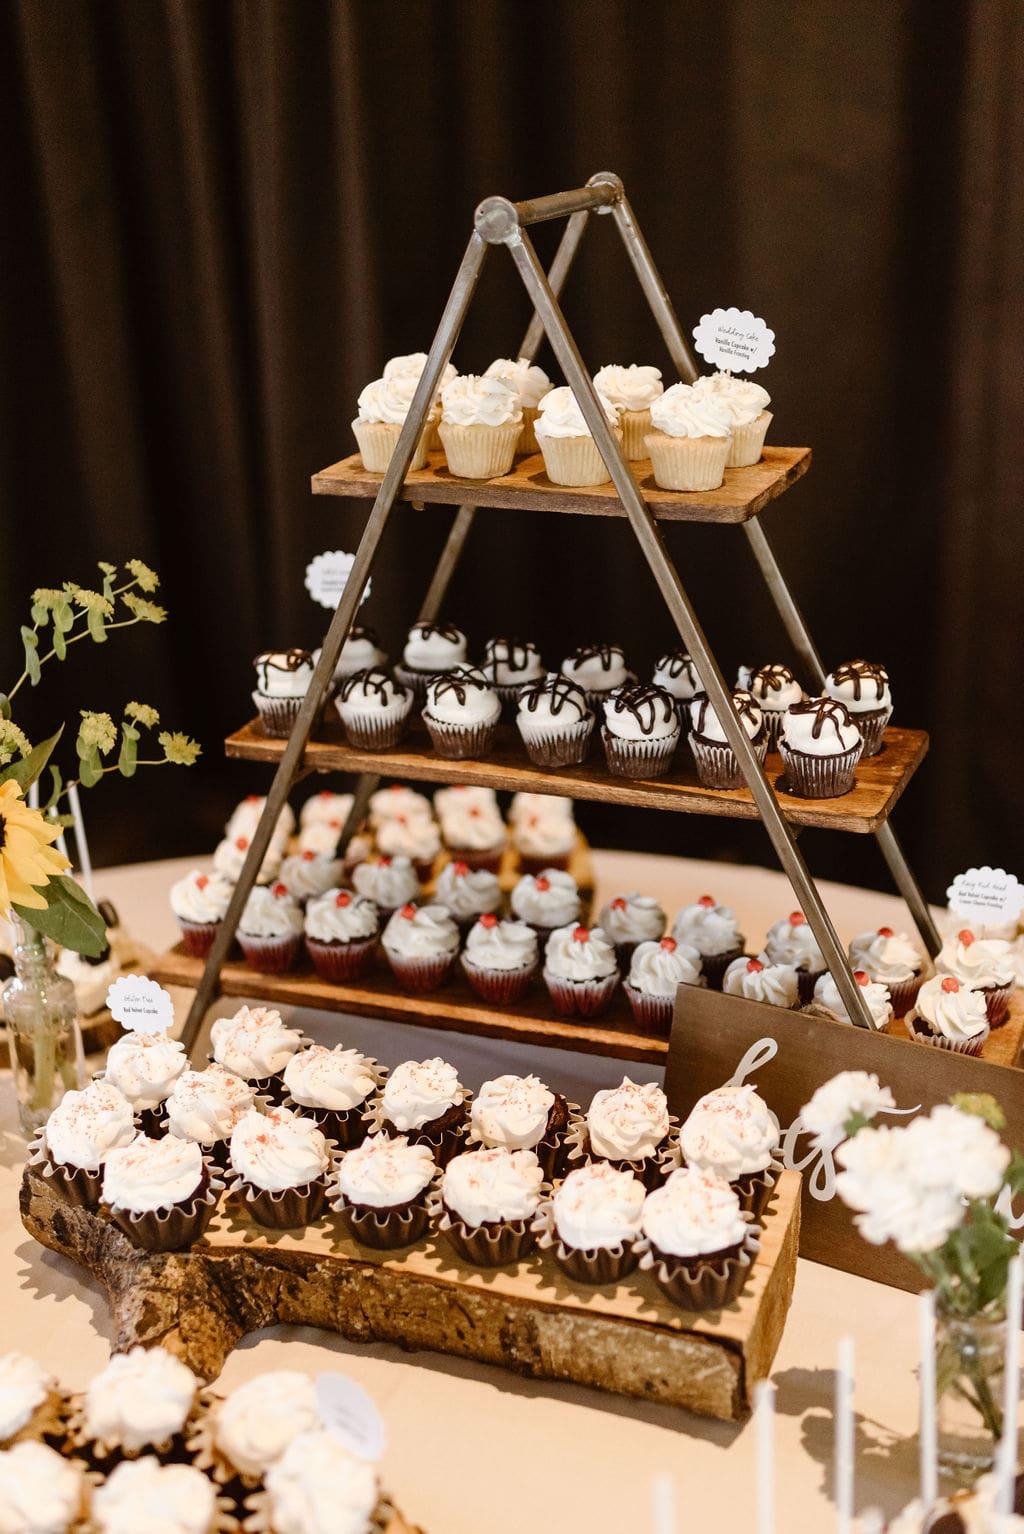 Ten mile station wedding reception Cake